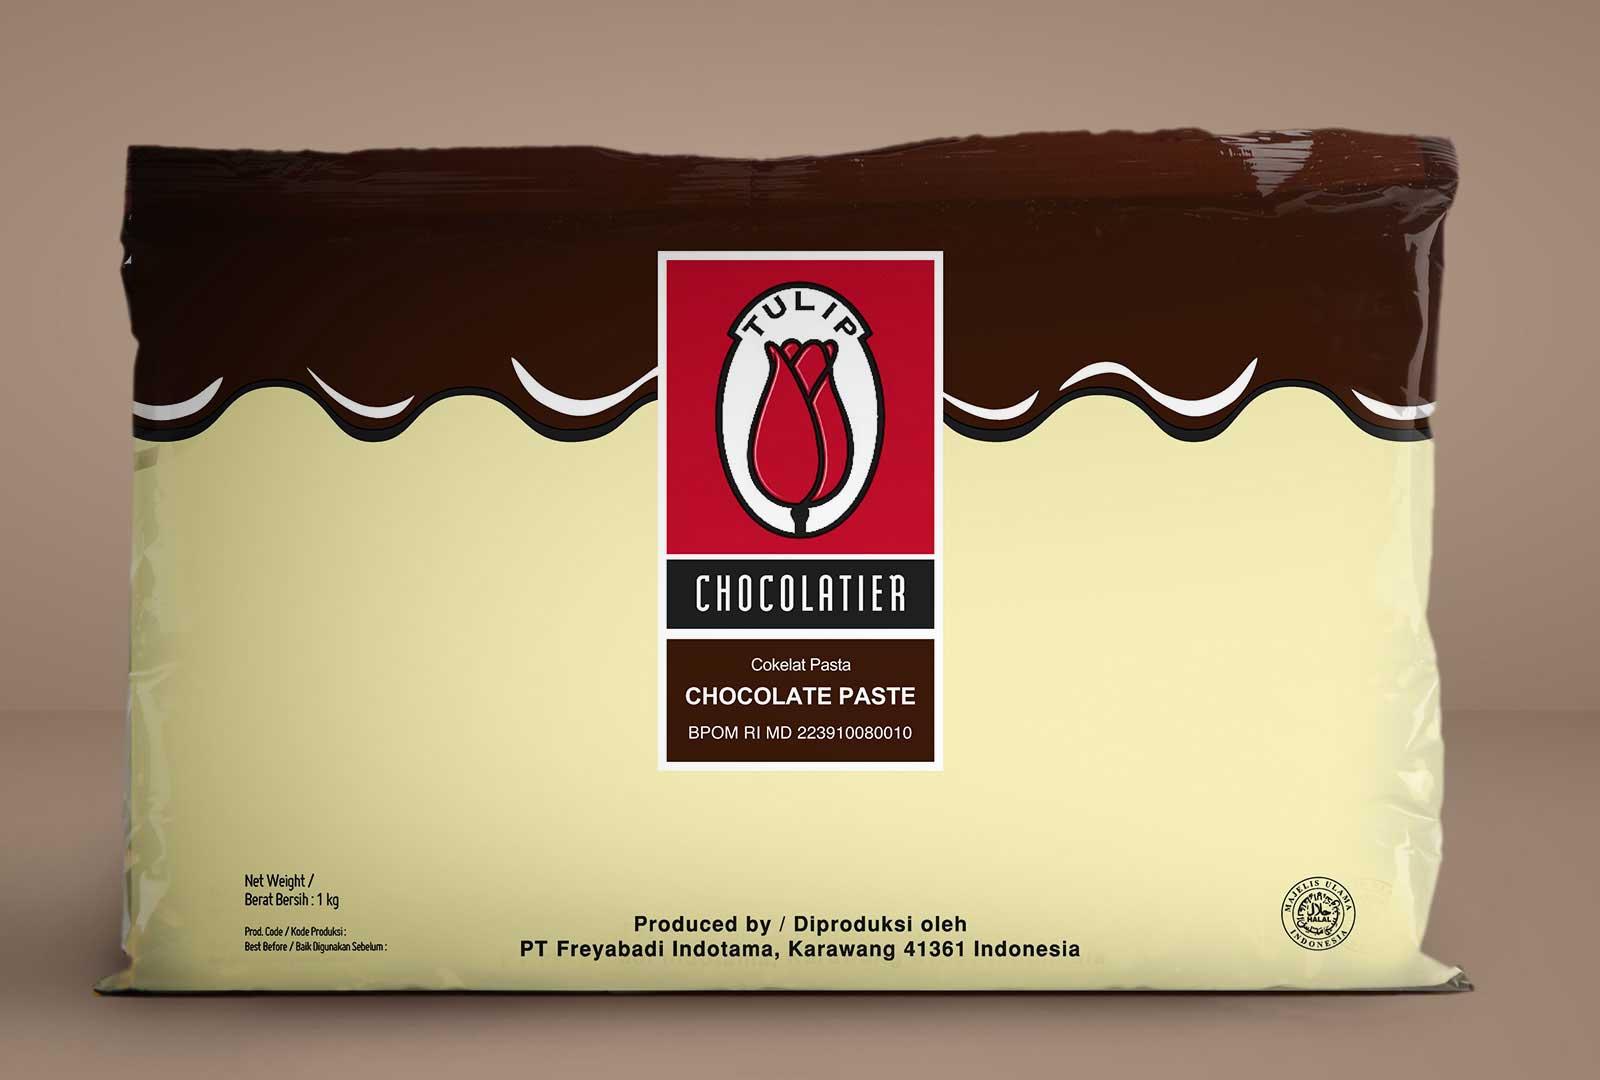 Tulip Chocolatier Chocolate Paste